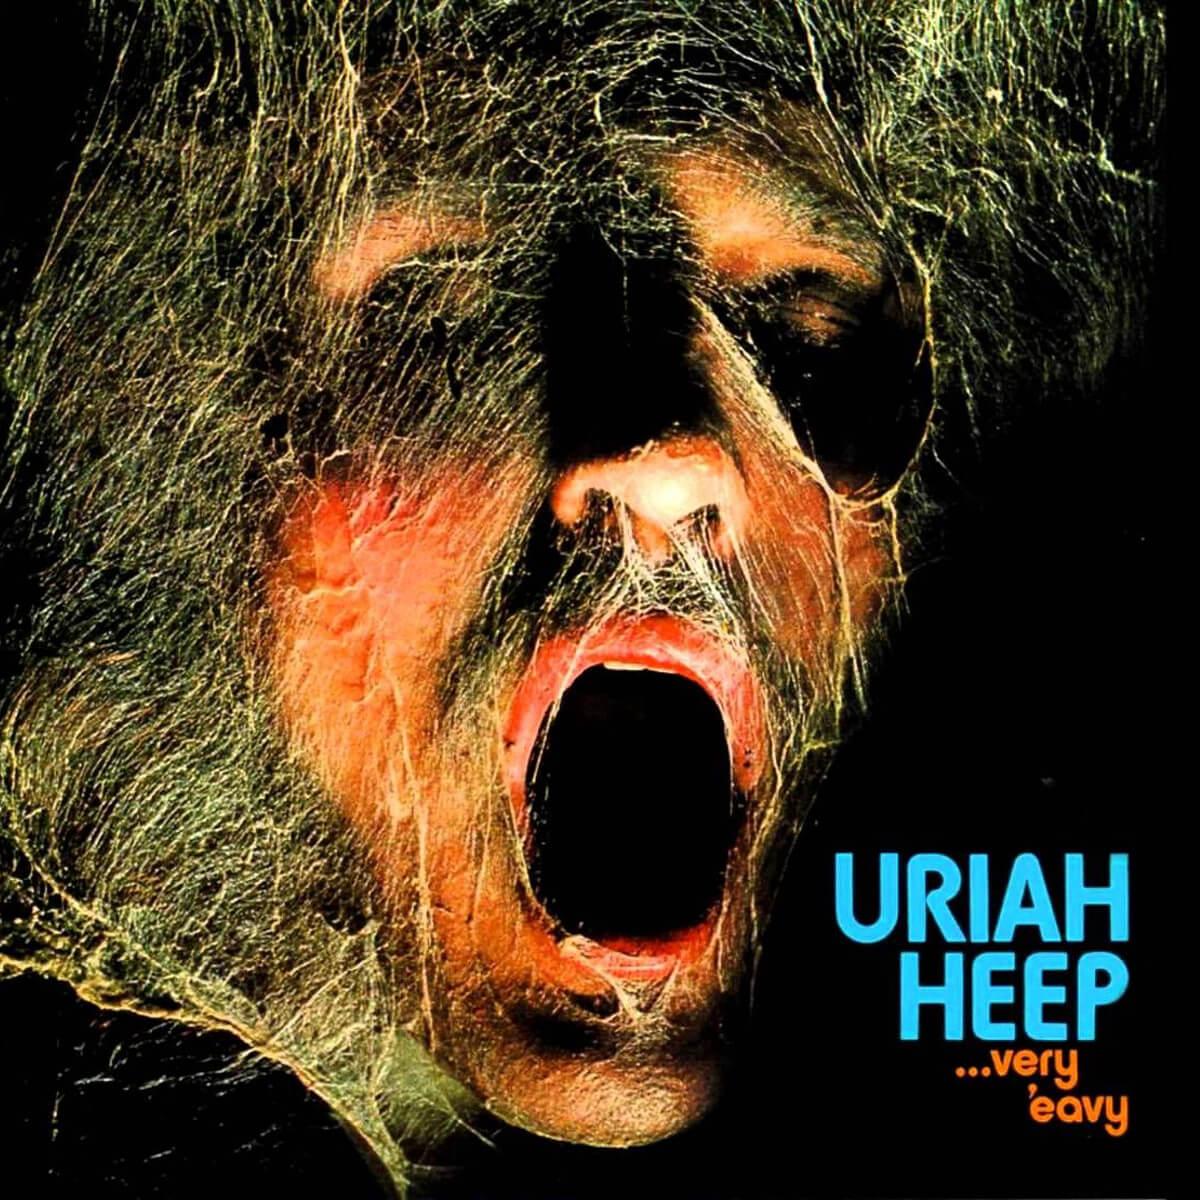 Uriah Heep - Very 'eavy - Vinil Cover